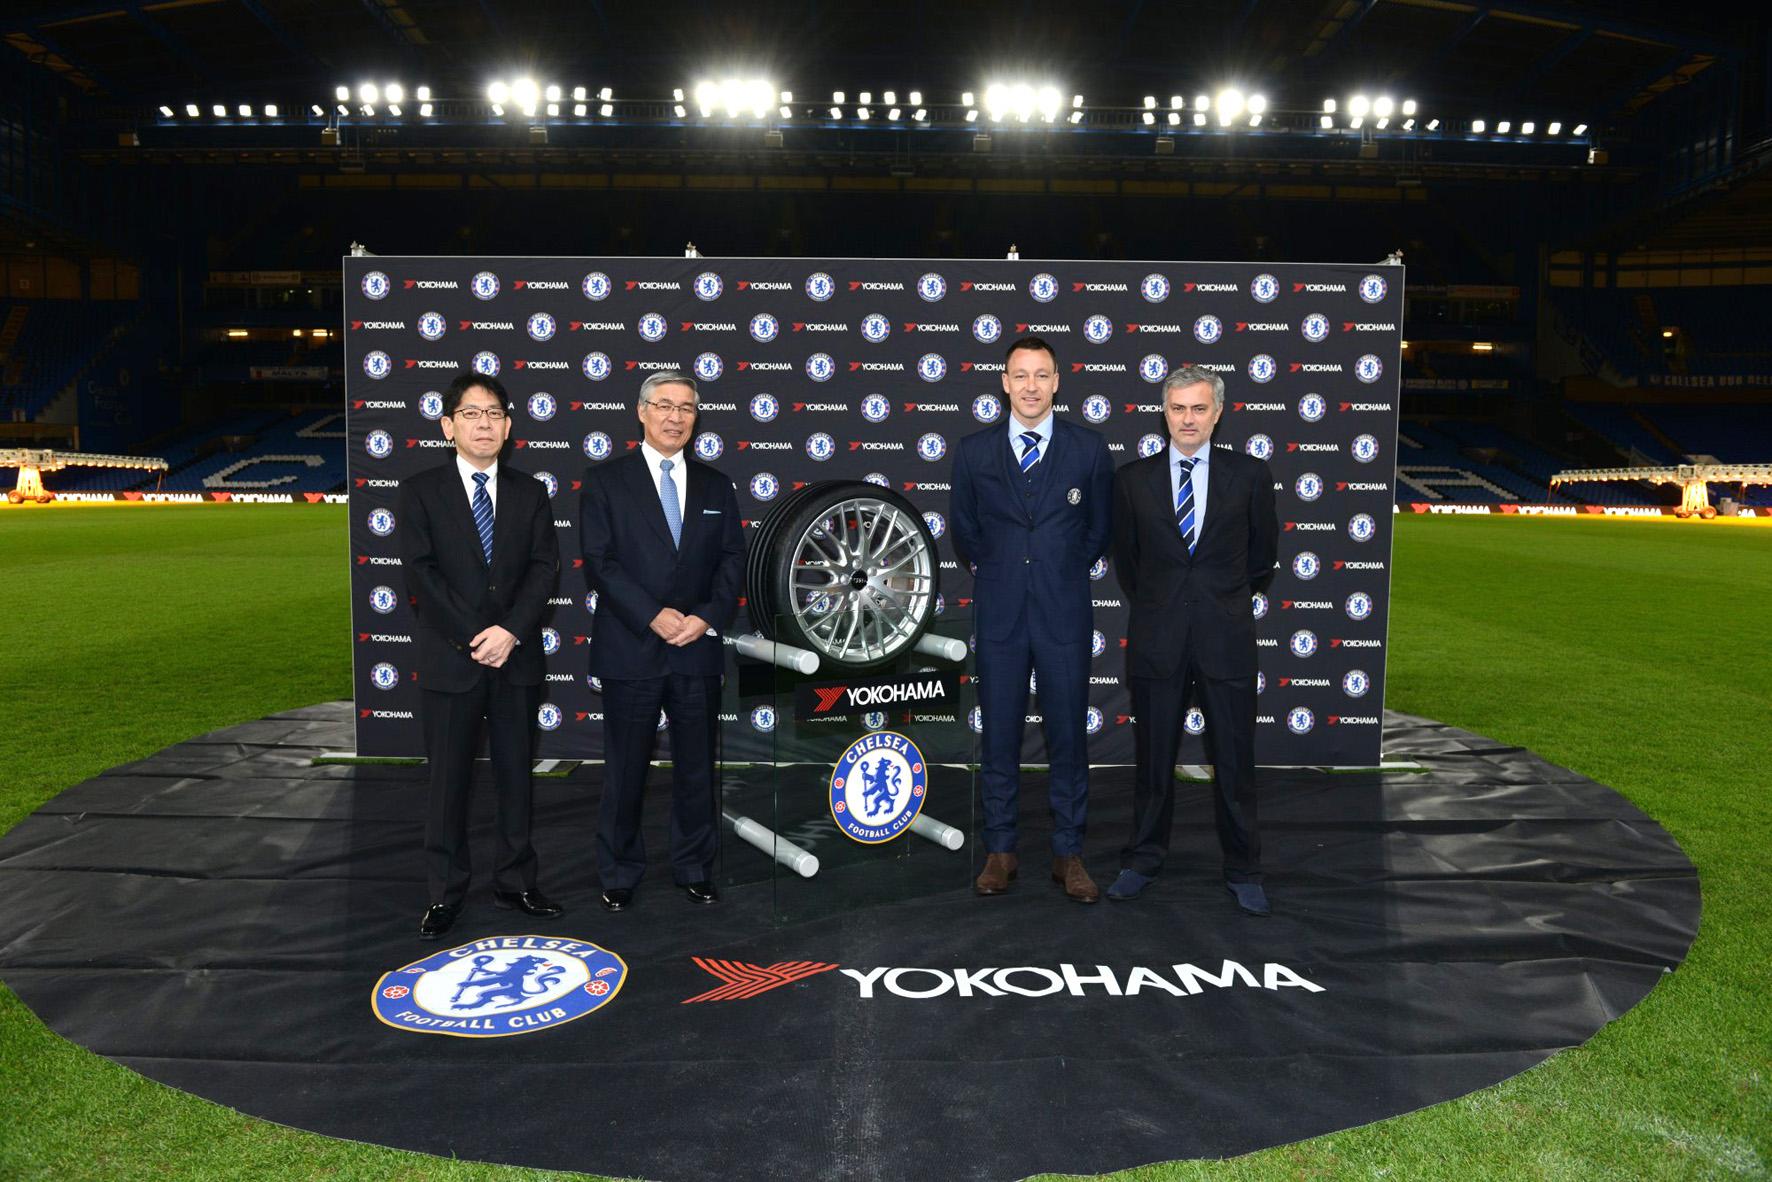 Yokohama nuovo sponsor Chelsea FC